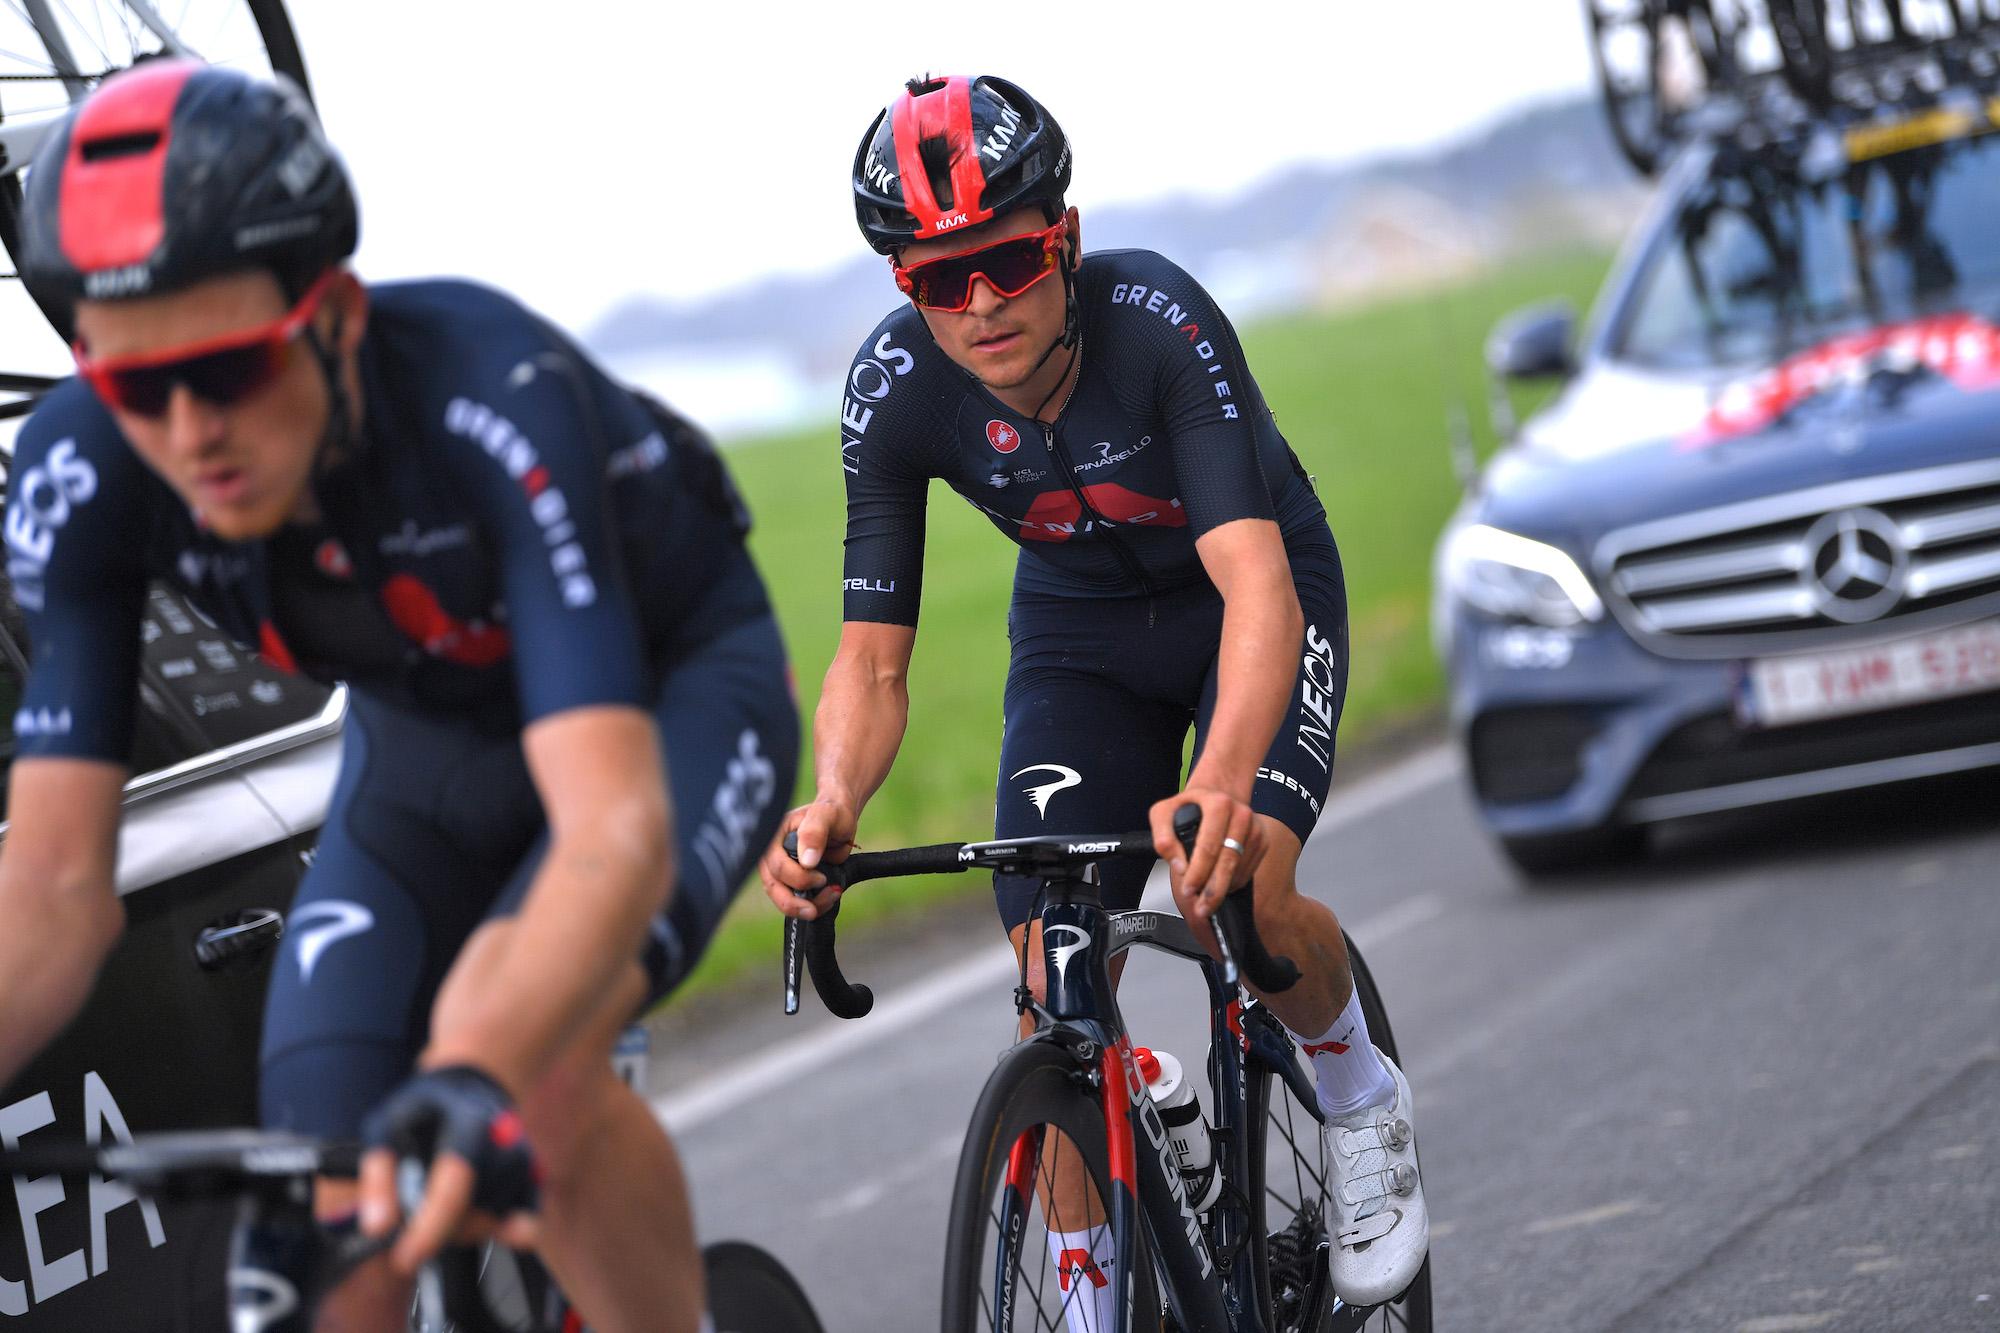 Tom Pidcock, Adam Yates et Tao Geoghegan Hart en tête de l'équipe Ineos Grenadiers Liège-Bastogne-Liège